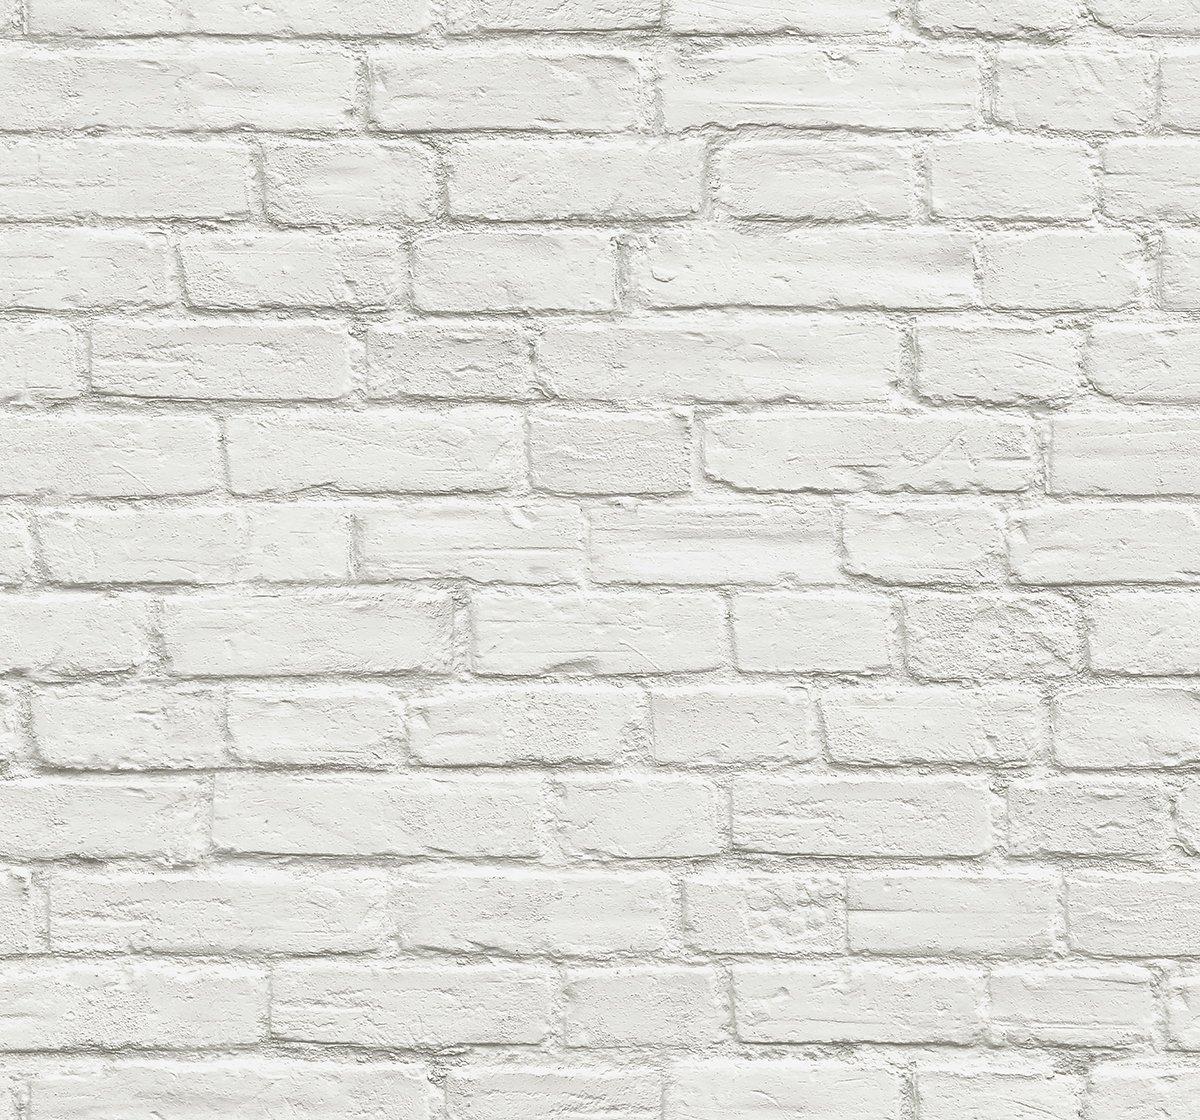 NextWall Vintage White Brick Peel and Stick Wallpaper